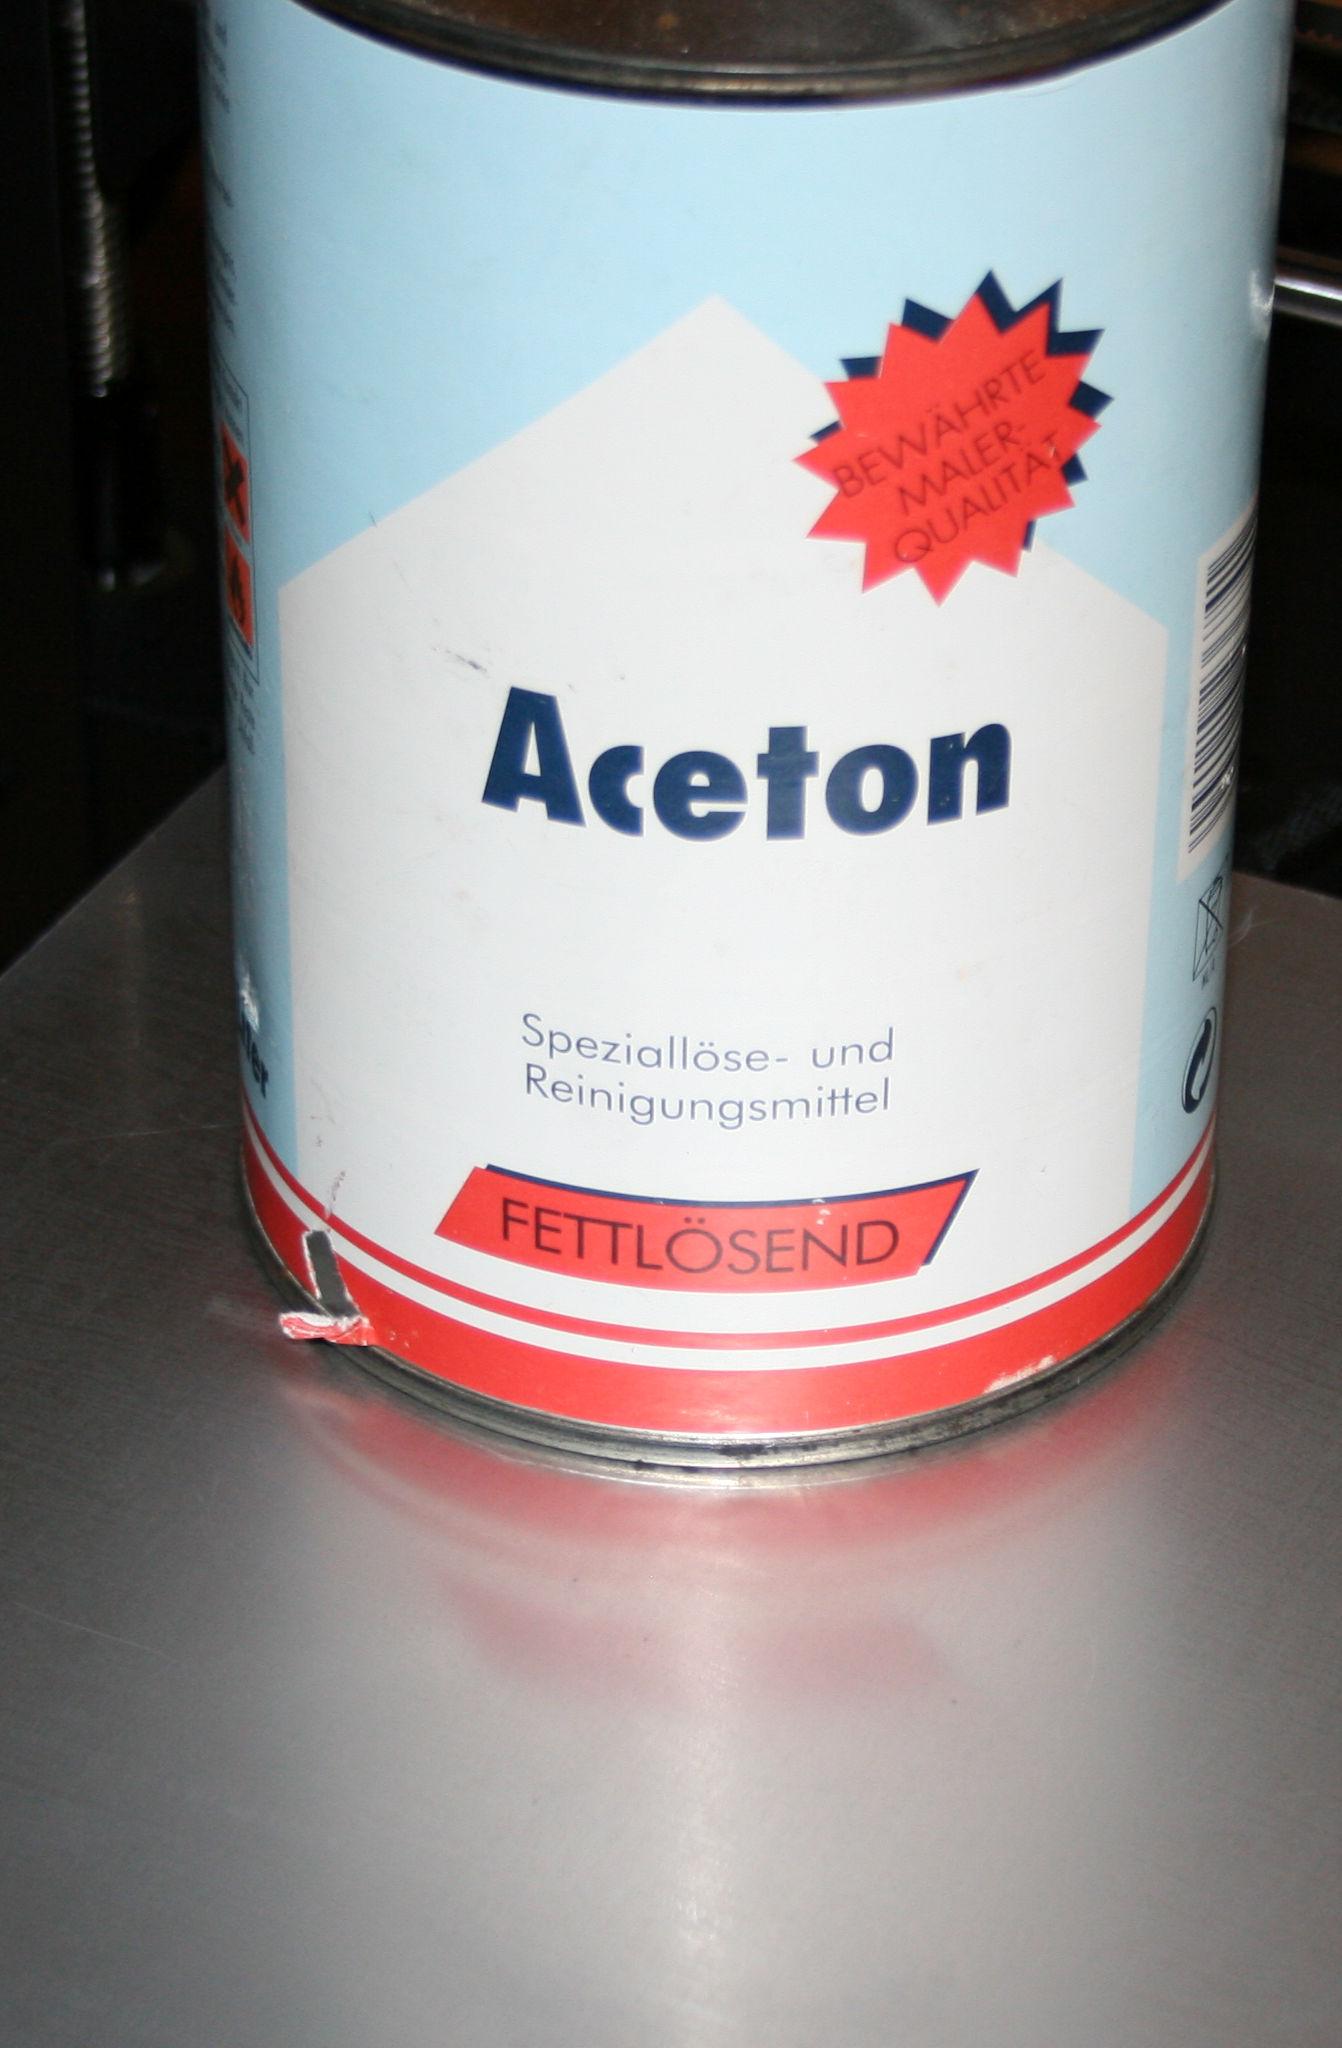 Aceton – drucktipps3d.de